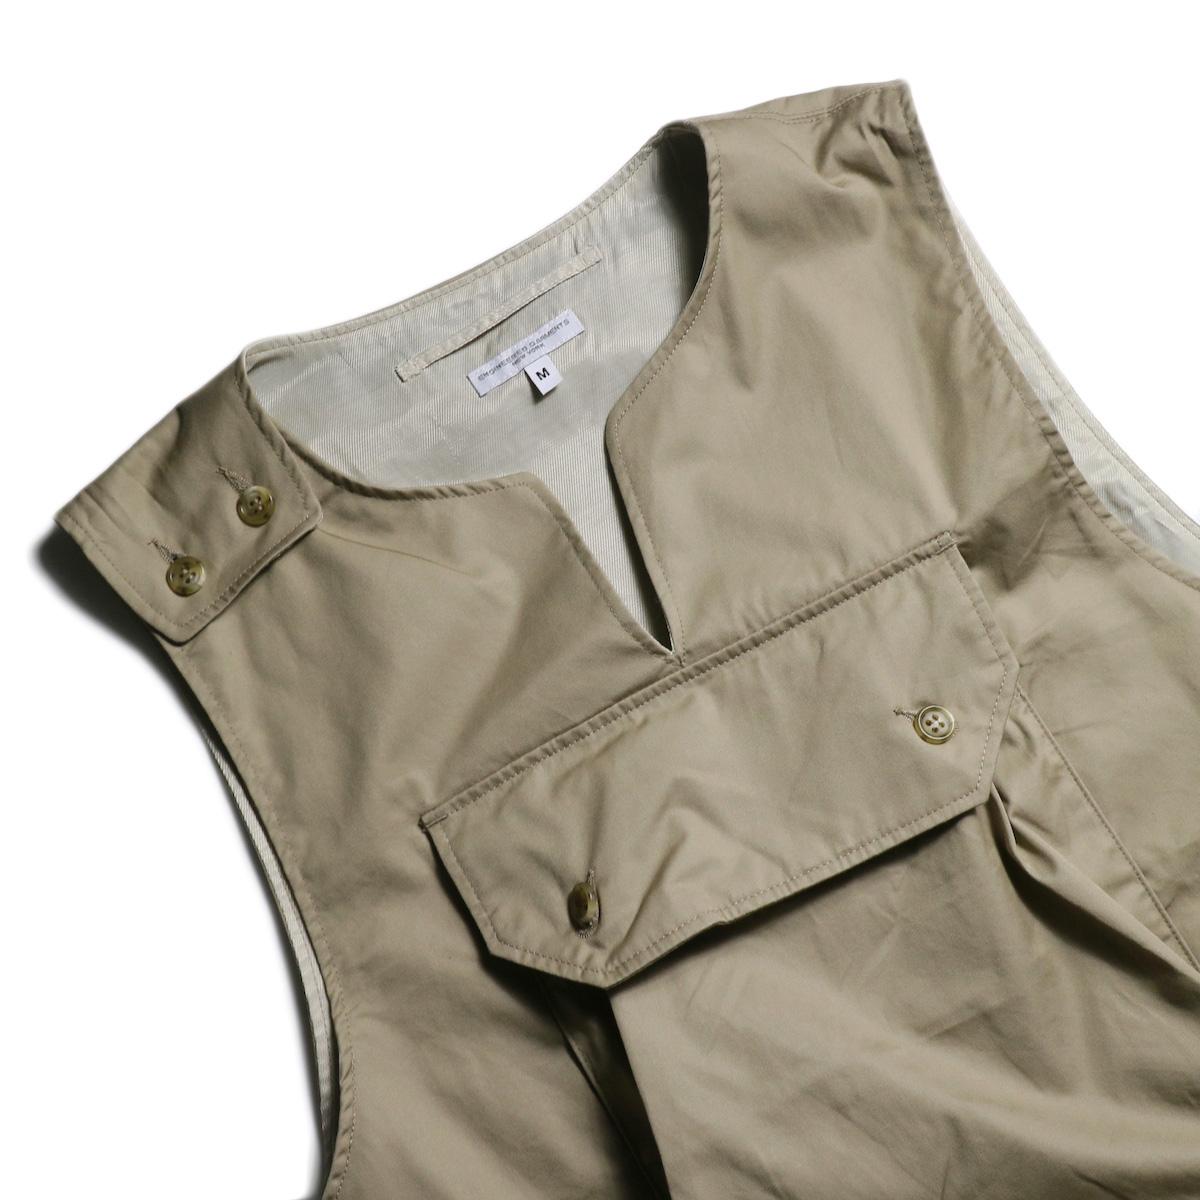 Engineered Garments / Cover Vest -High Count Twill (Khaki) 首周り